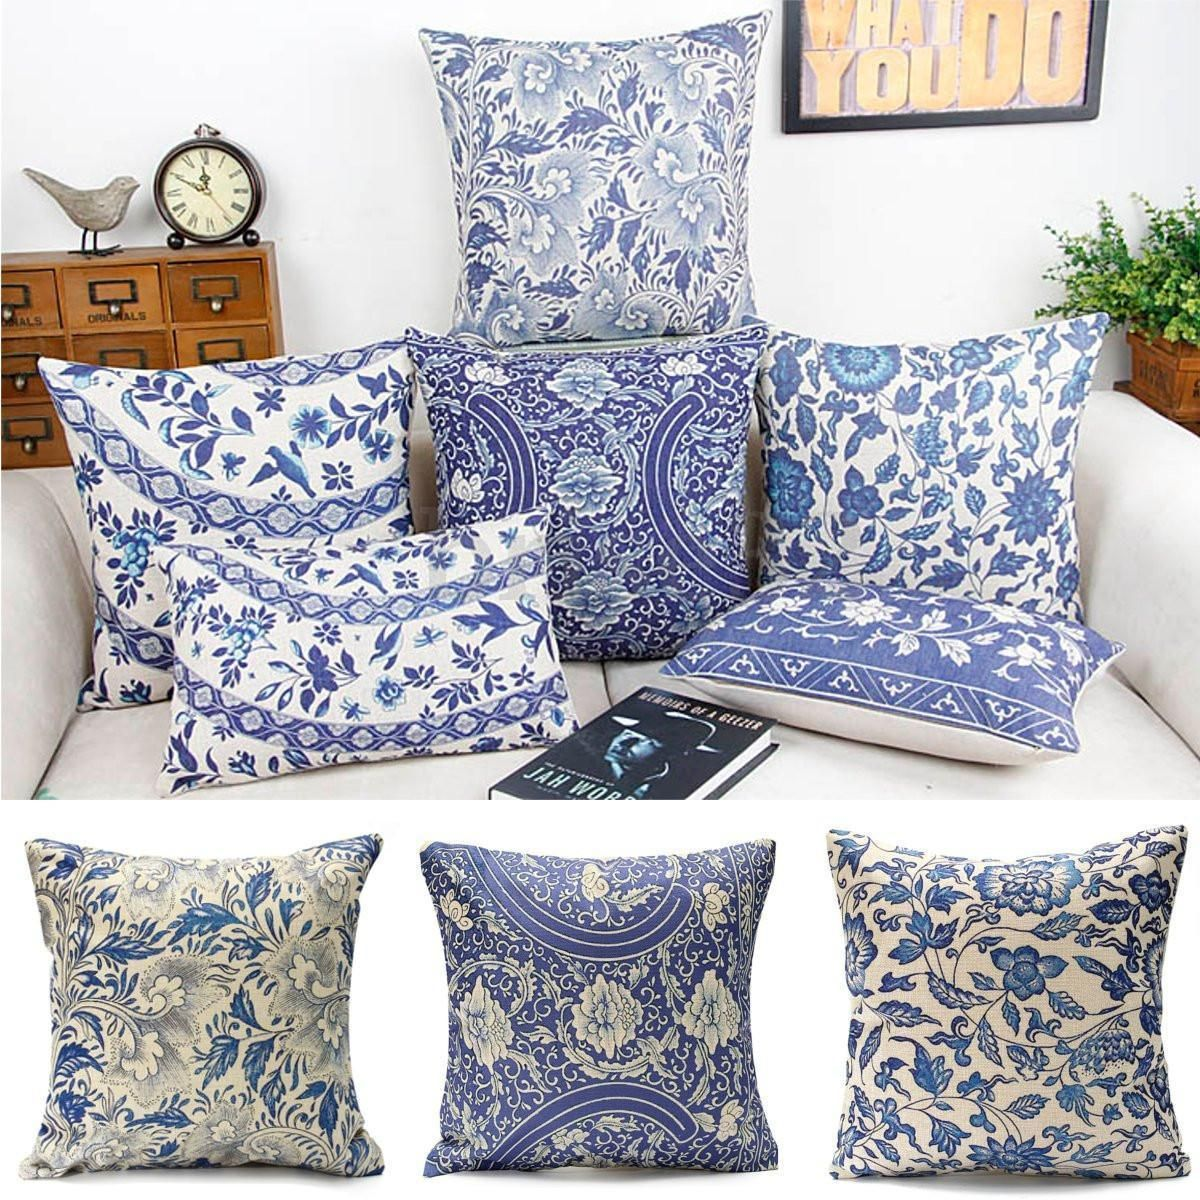 details about vintage oriental blue floral cotton linen. Black Bedroom Furniture Sets. Home Design Ideas